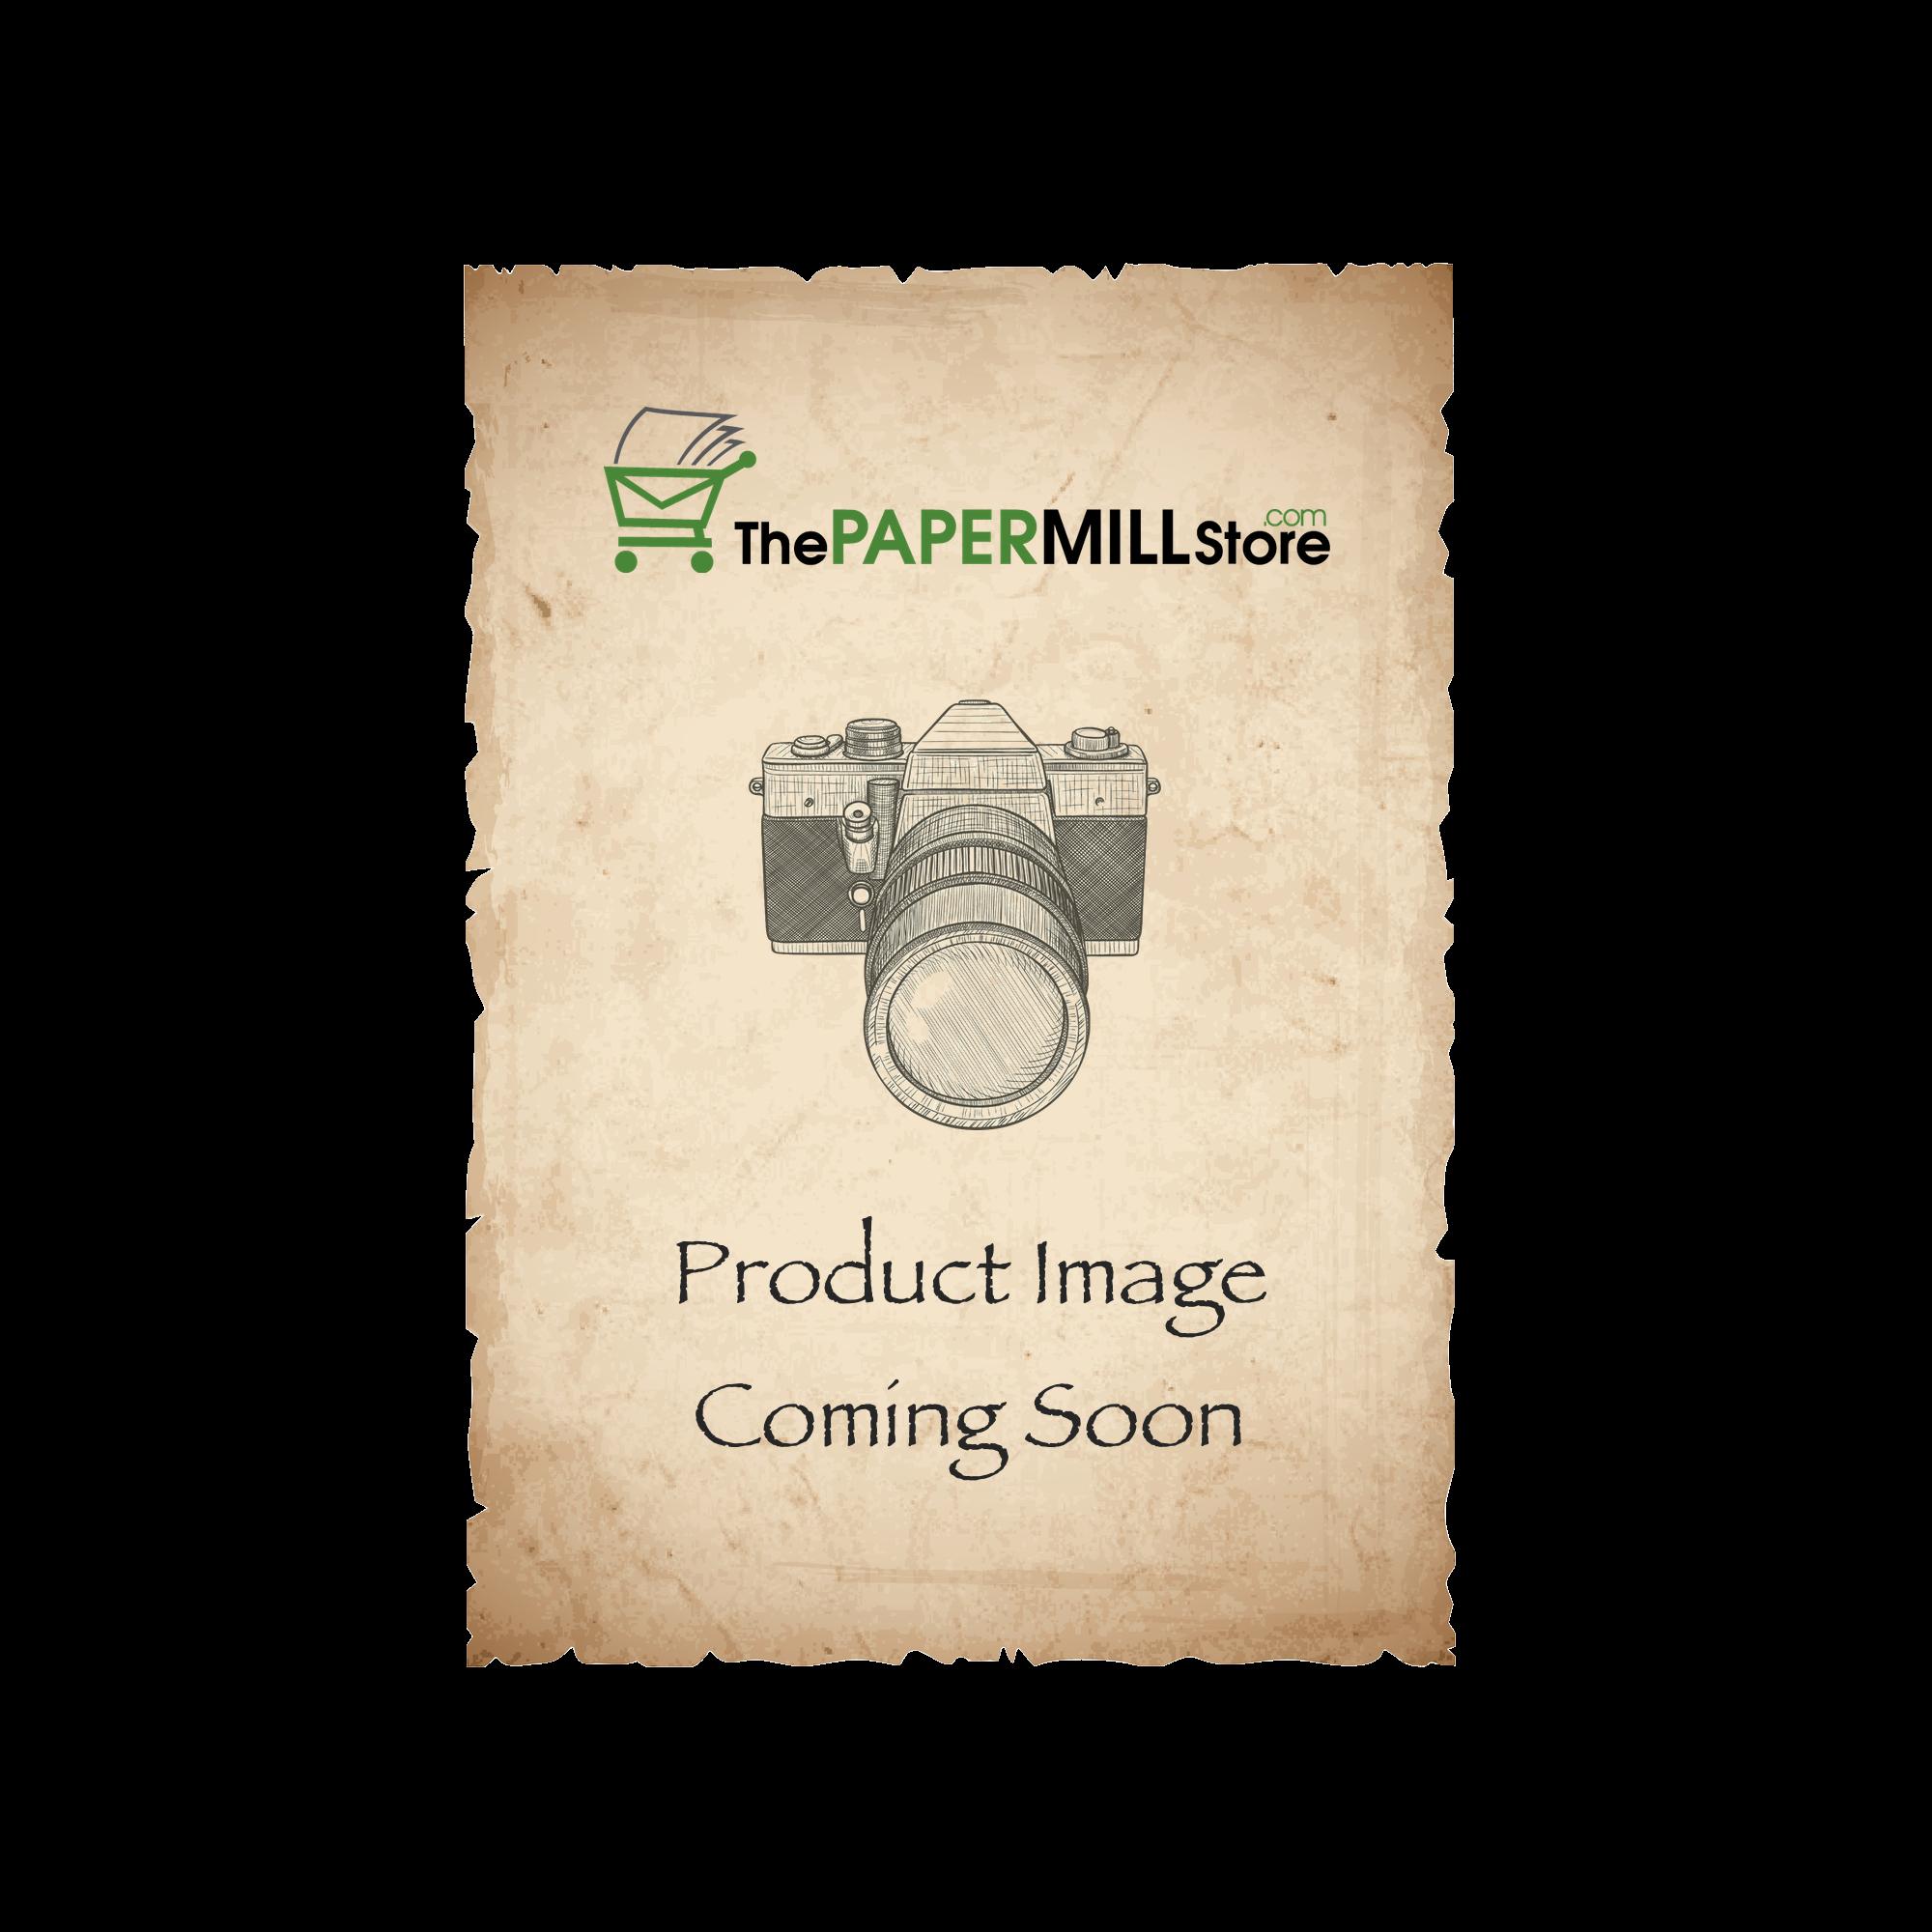 Ultrafelt Black Card Stock - 26 x 40 in 80 lb Cover Premium Felt  30% Recycled 500 per Carton